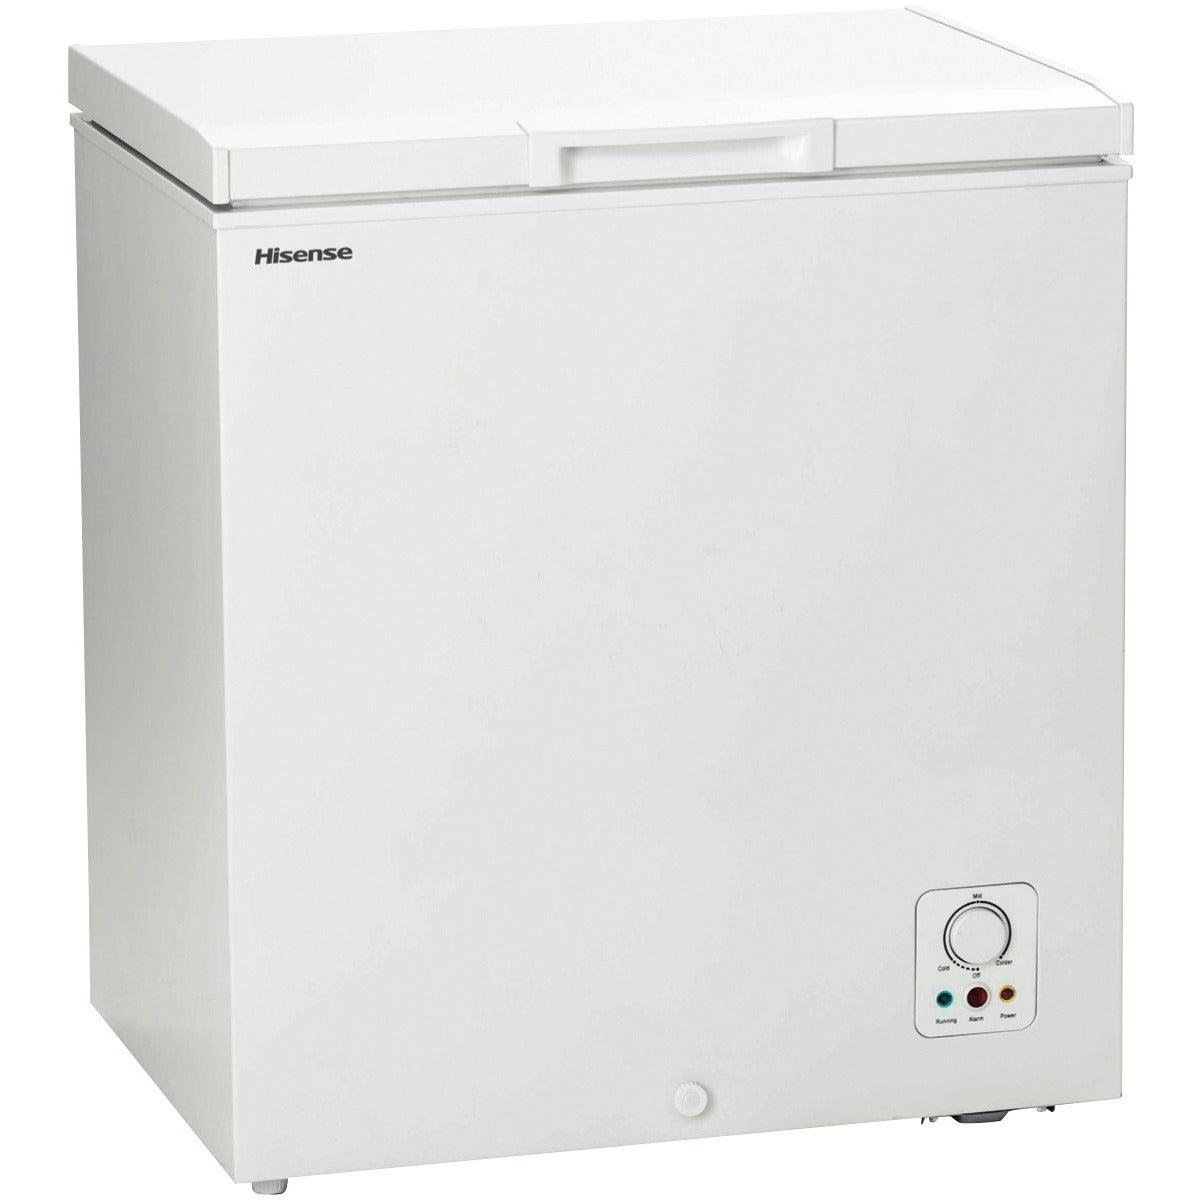 Hisense HR6CF146 Freezer